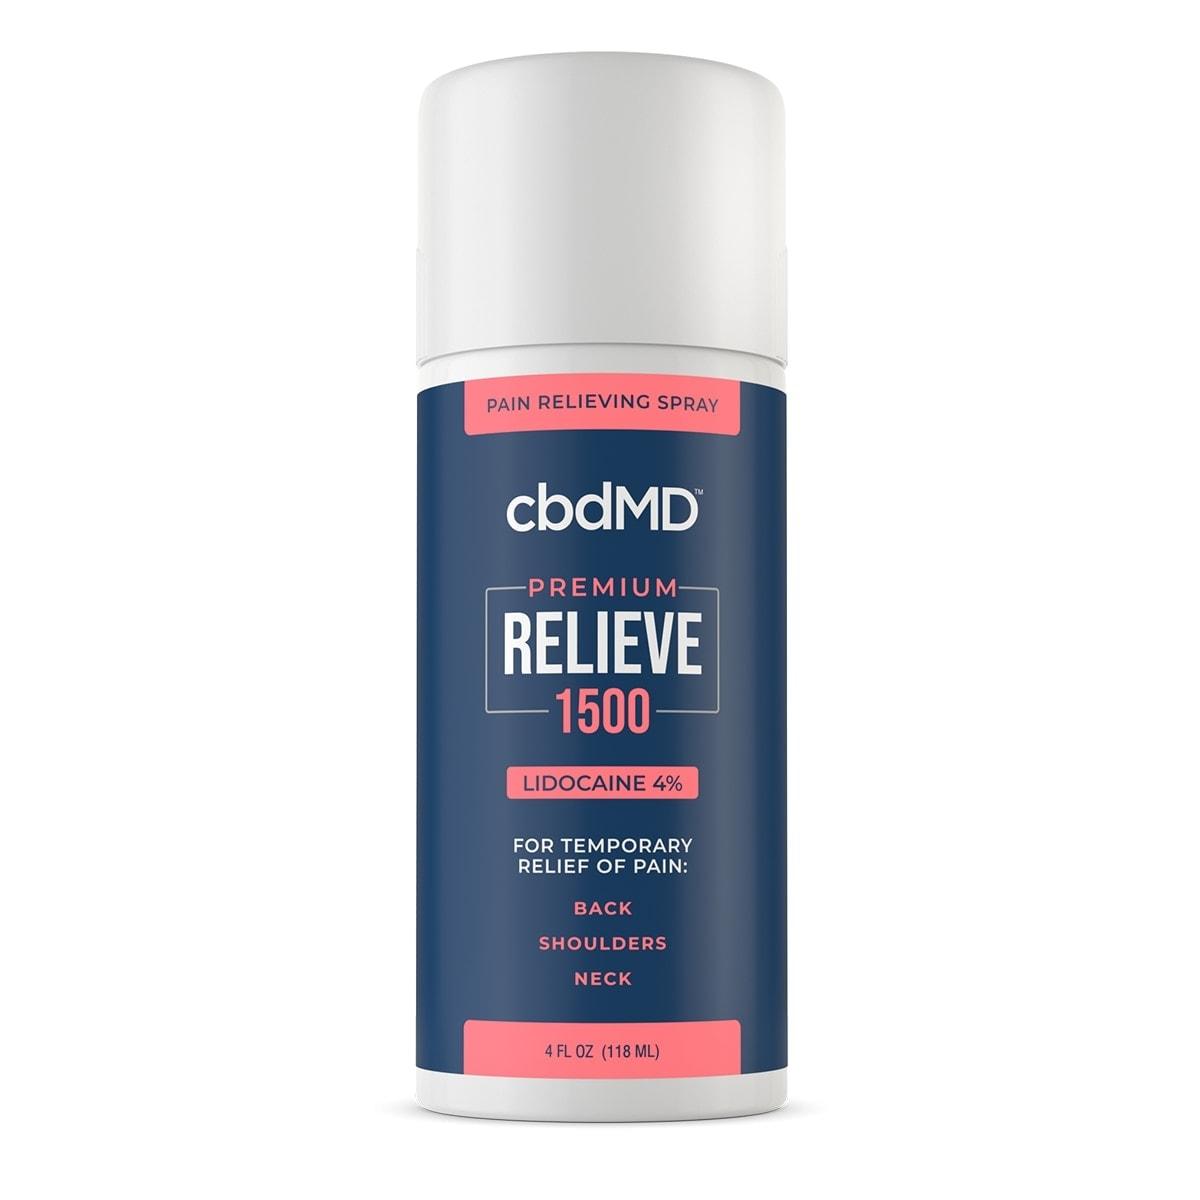 cbdMD, CBD Lidocaine Spray, Broad Spectrum THC-Free, 4oz, 1500mg of CBD